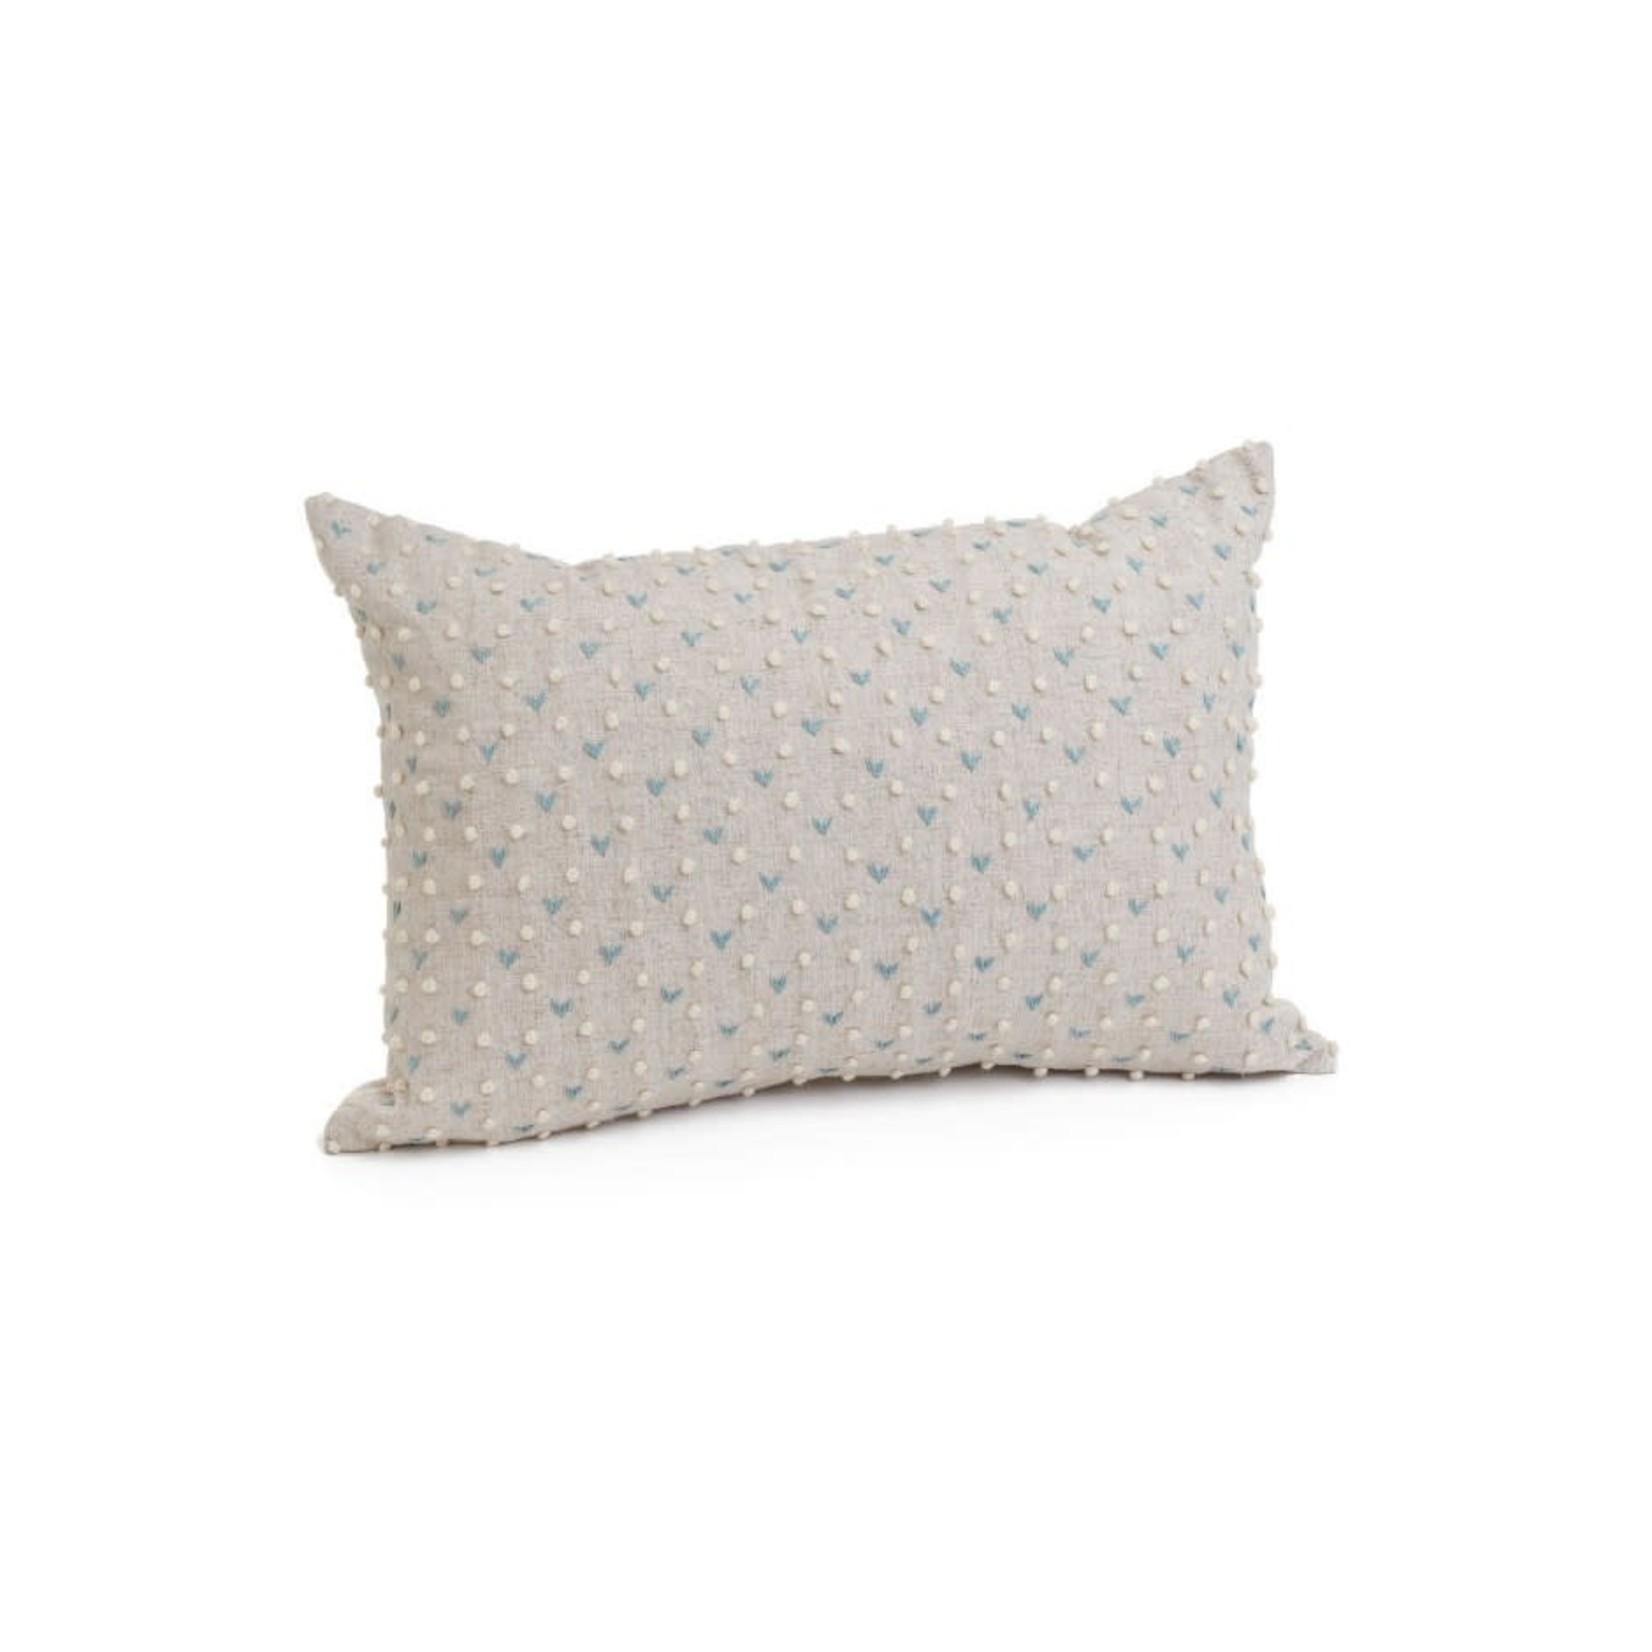 Knots Cushion